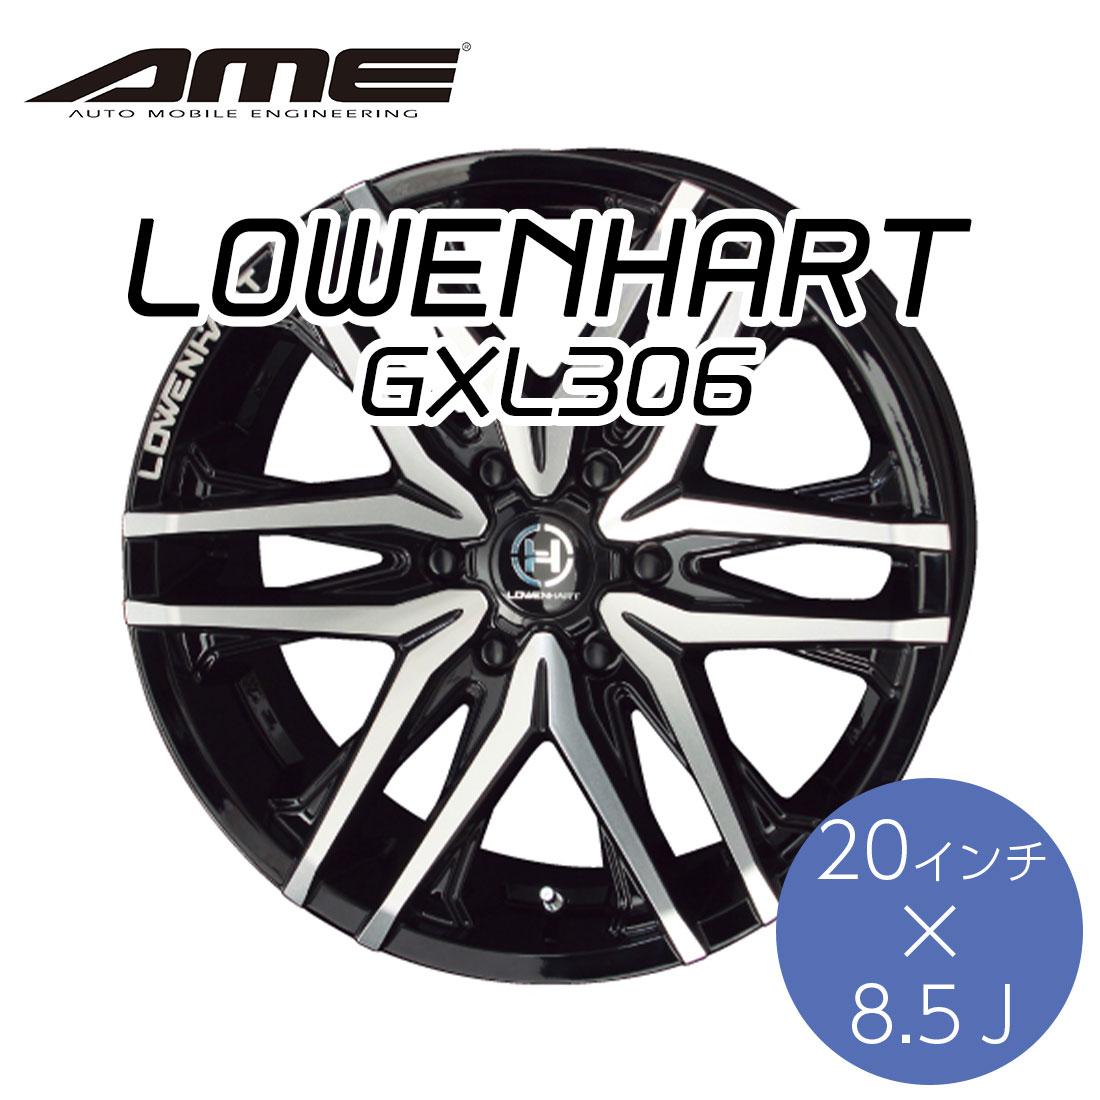 KYOHO ホイール レーベンハート GXL306 20×8.5J インチ 6H PCD 139.7 LOWENHART by AME 共豊 グロスブラック×ポリッシュ かっこいい 車